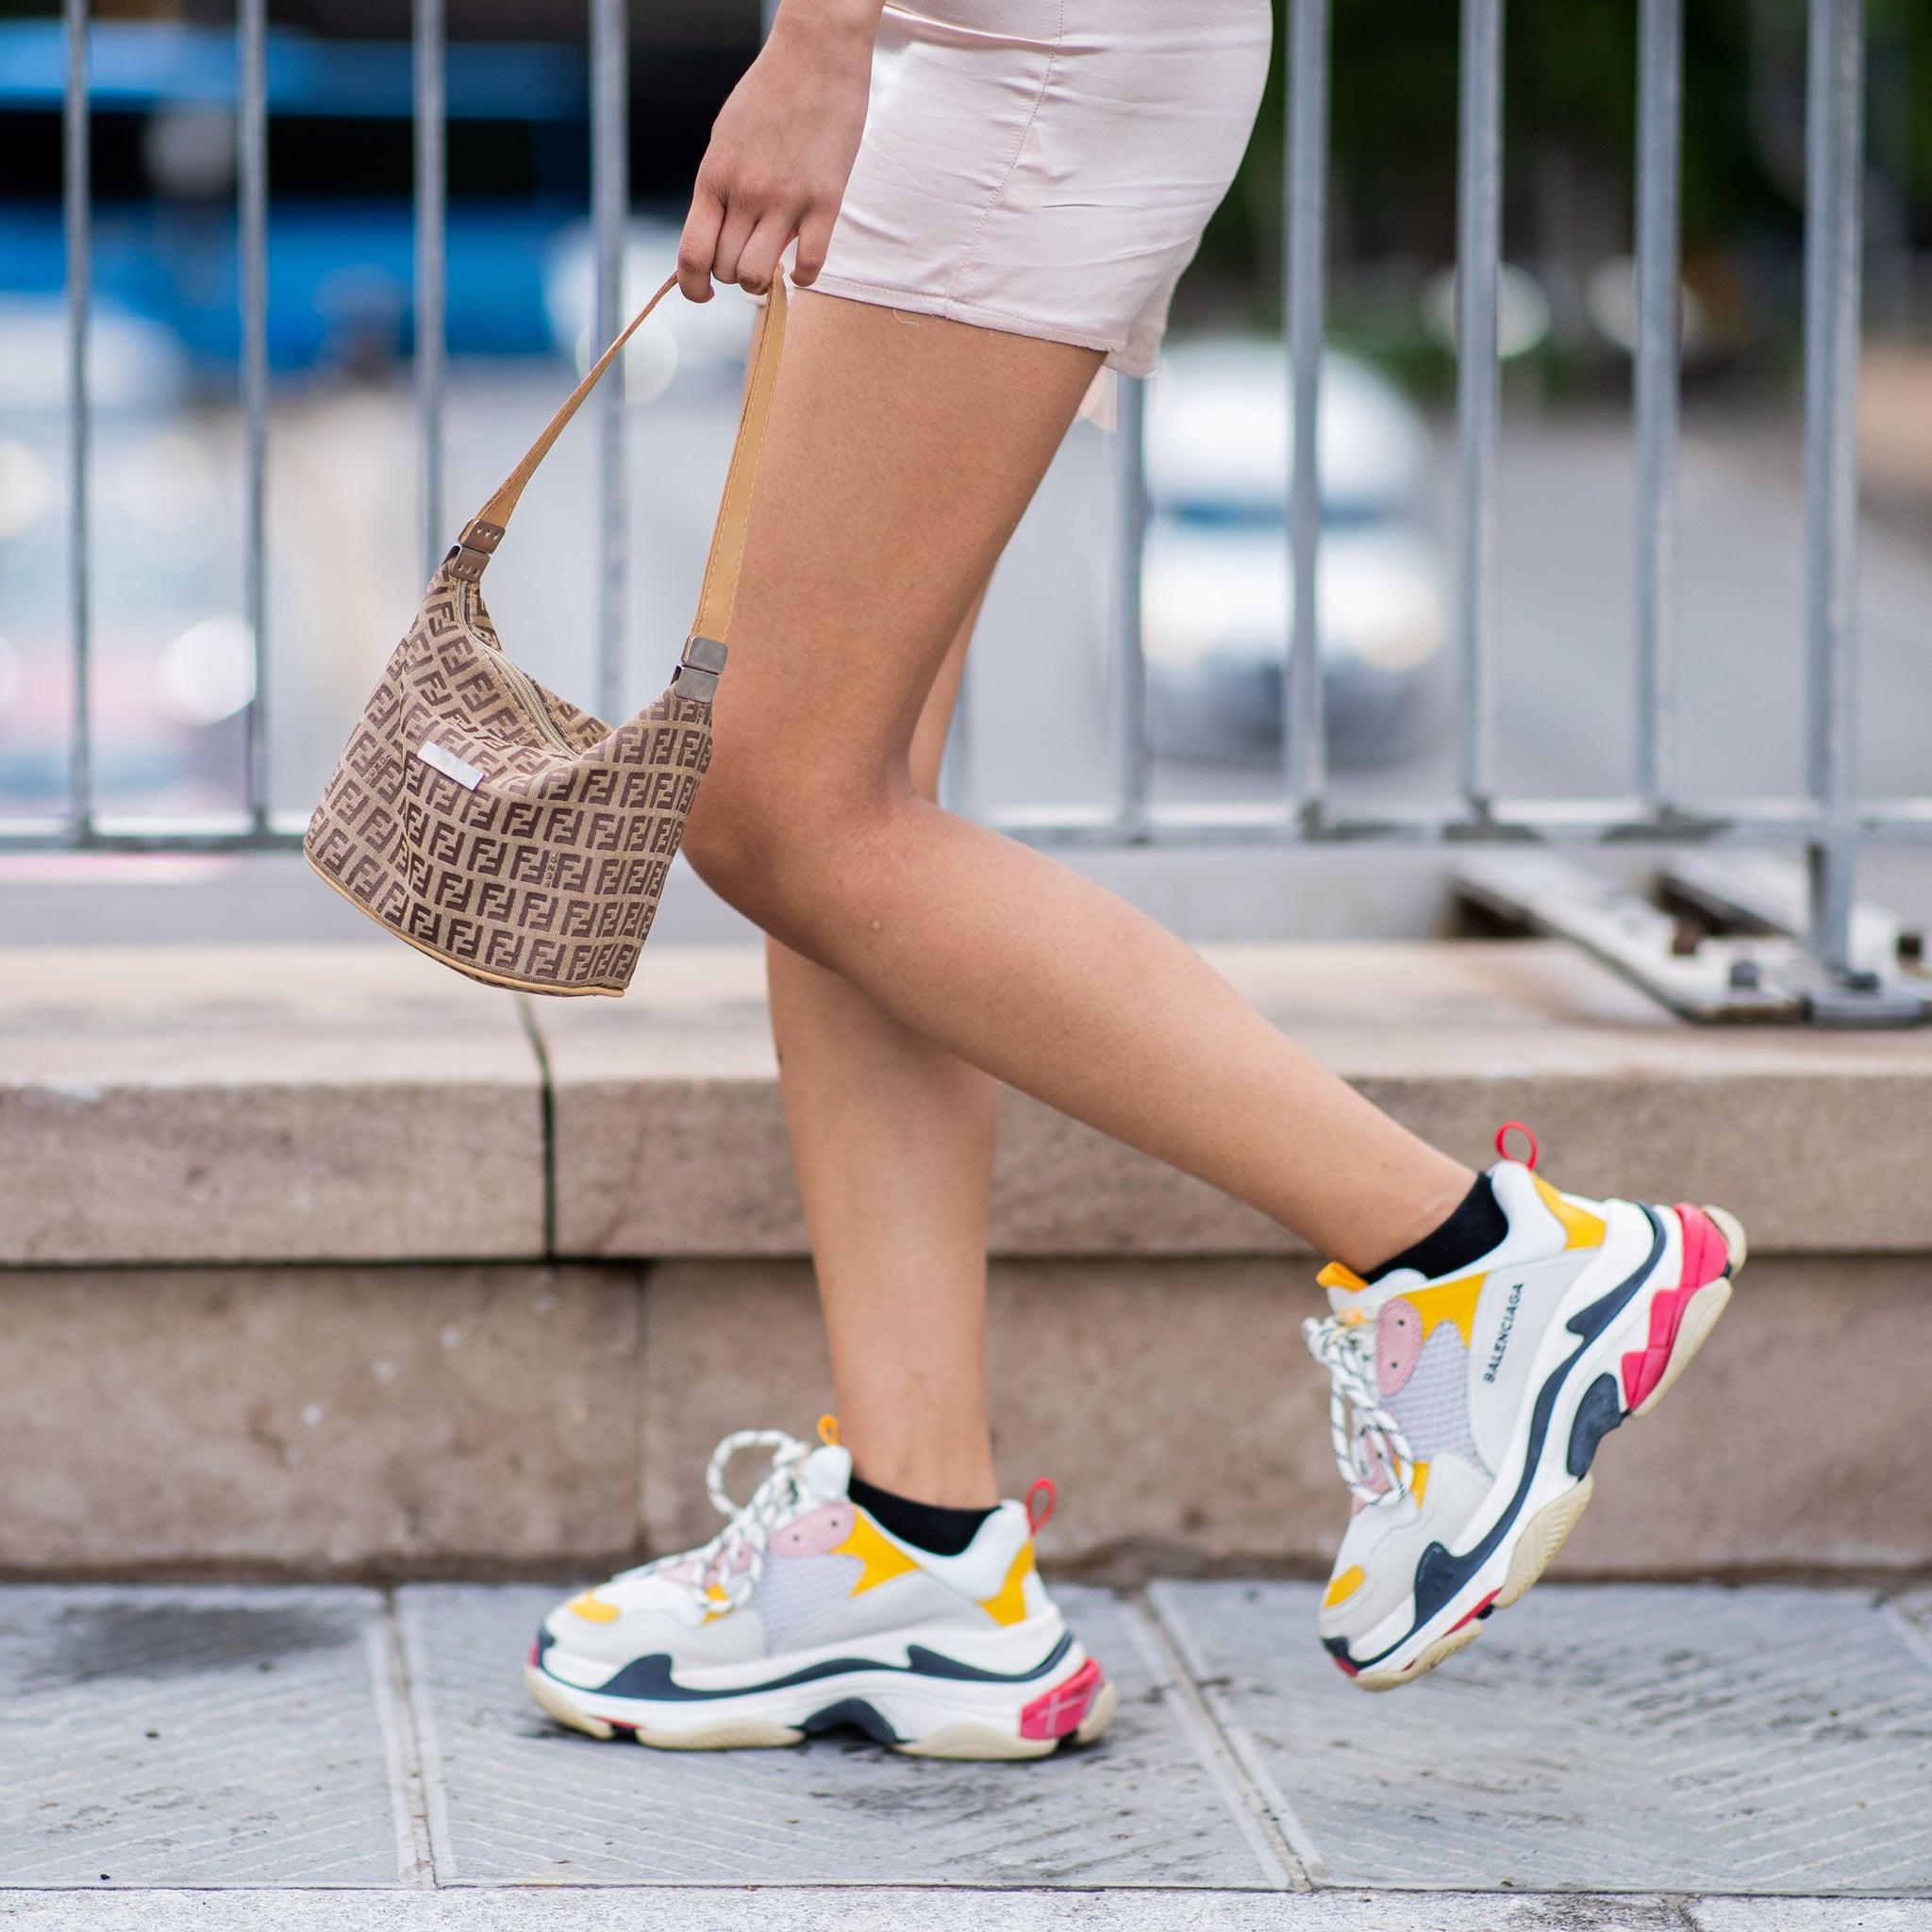 Cute Sneakers 2018 | POPSUGAR Fashion